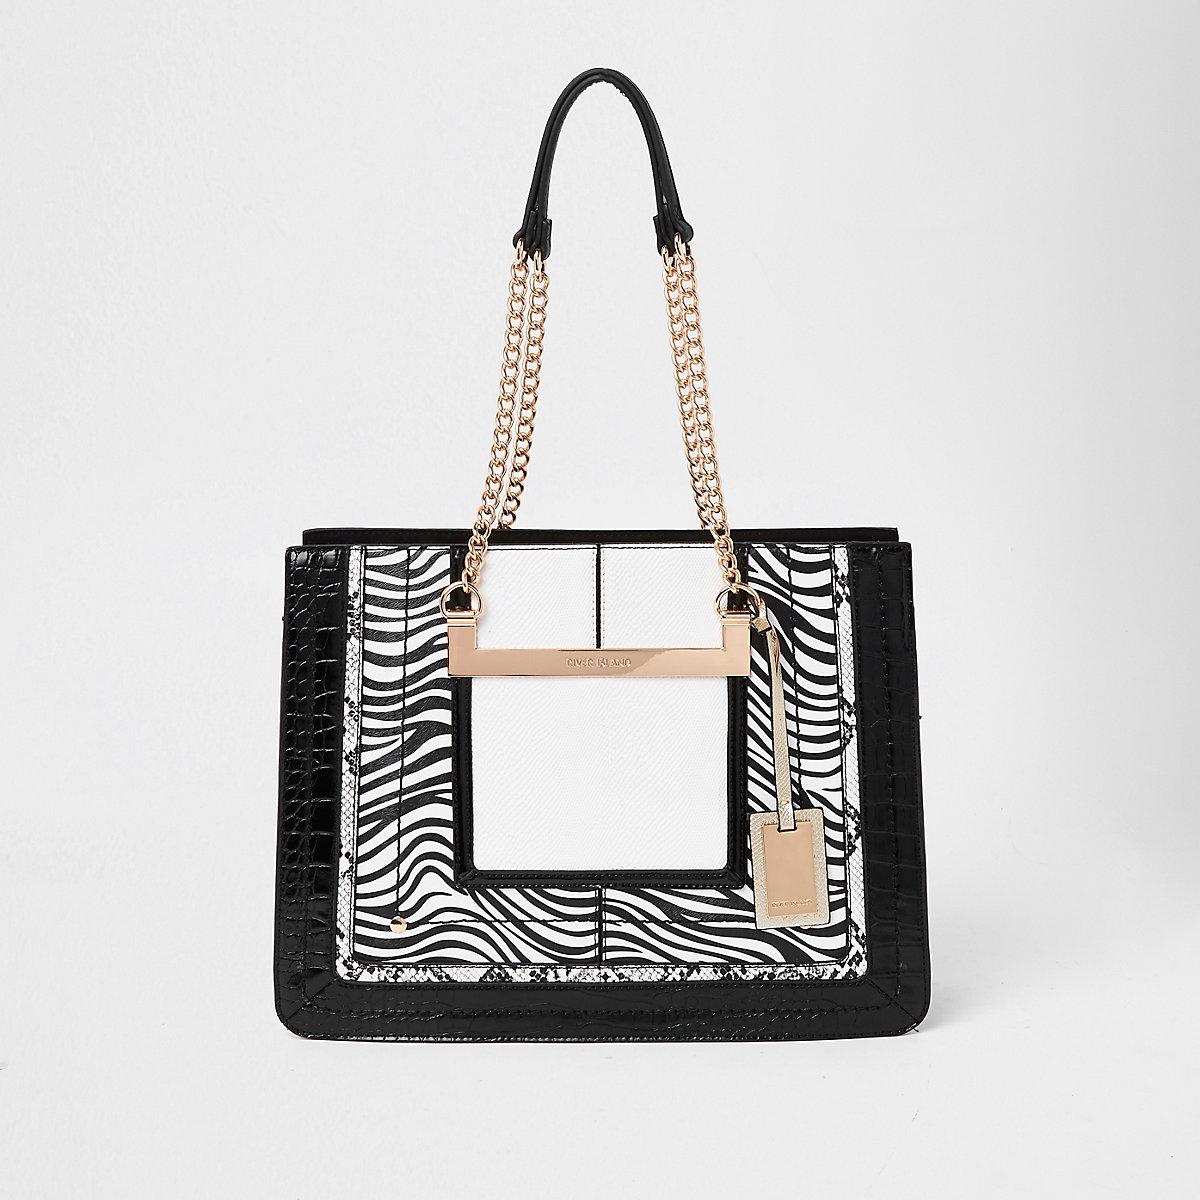 White zebra print chain handle tote bag